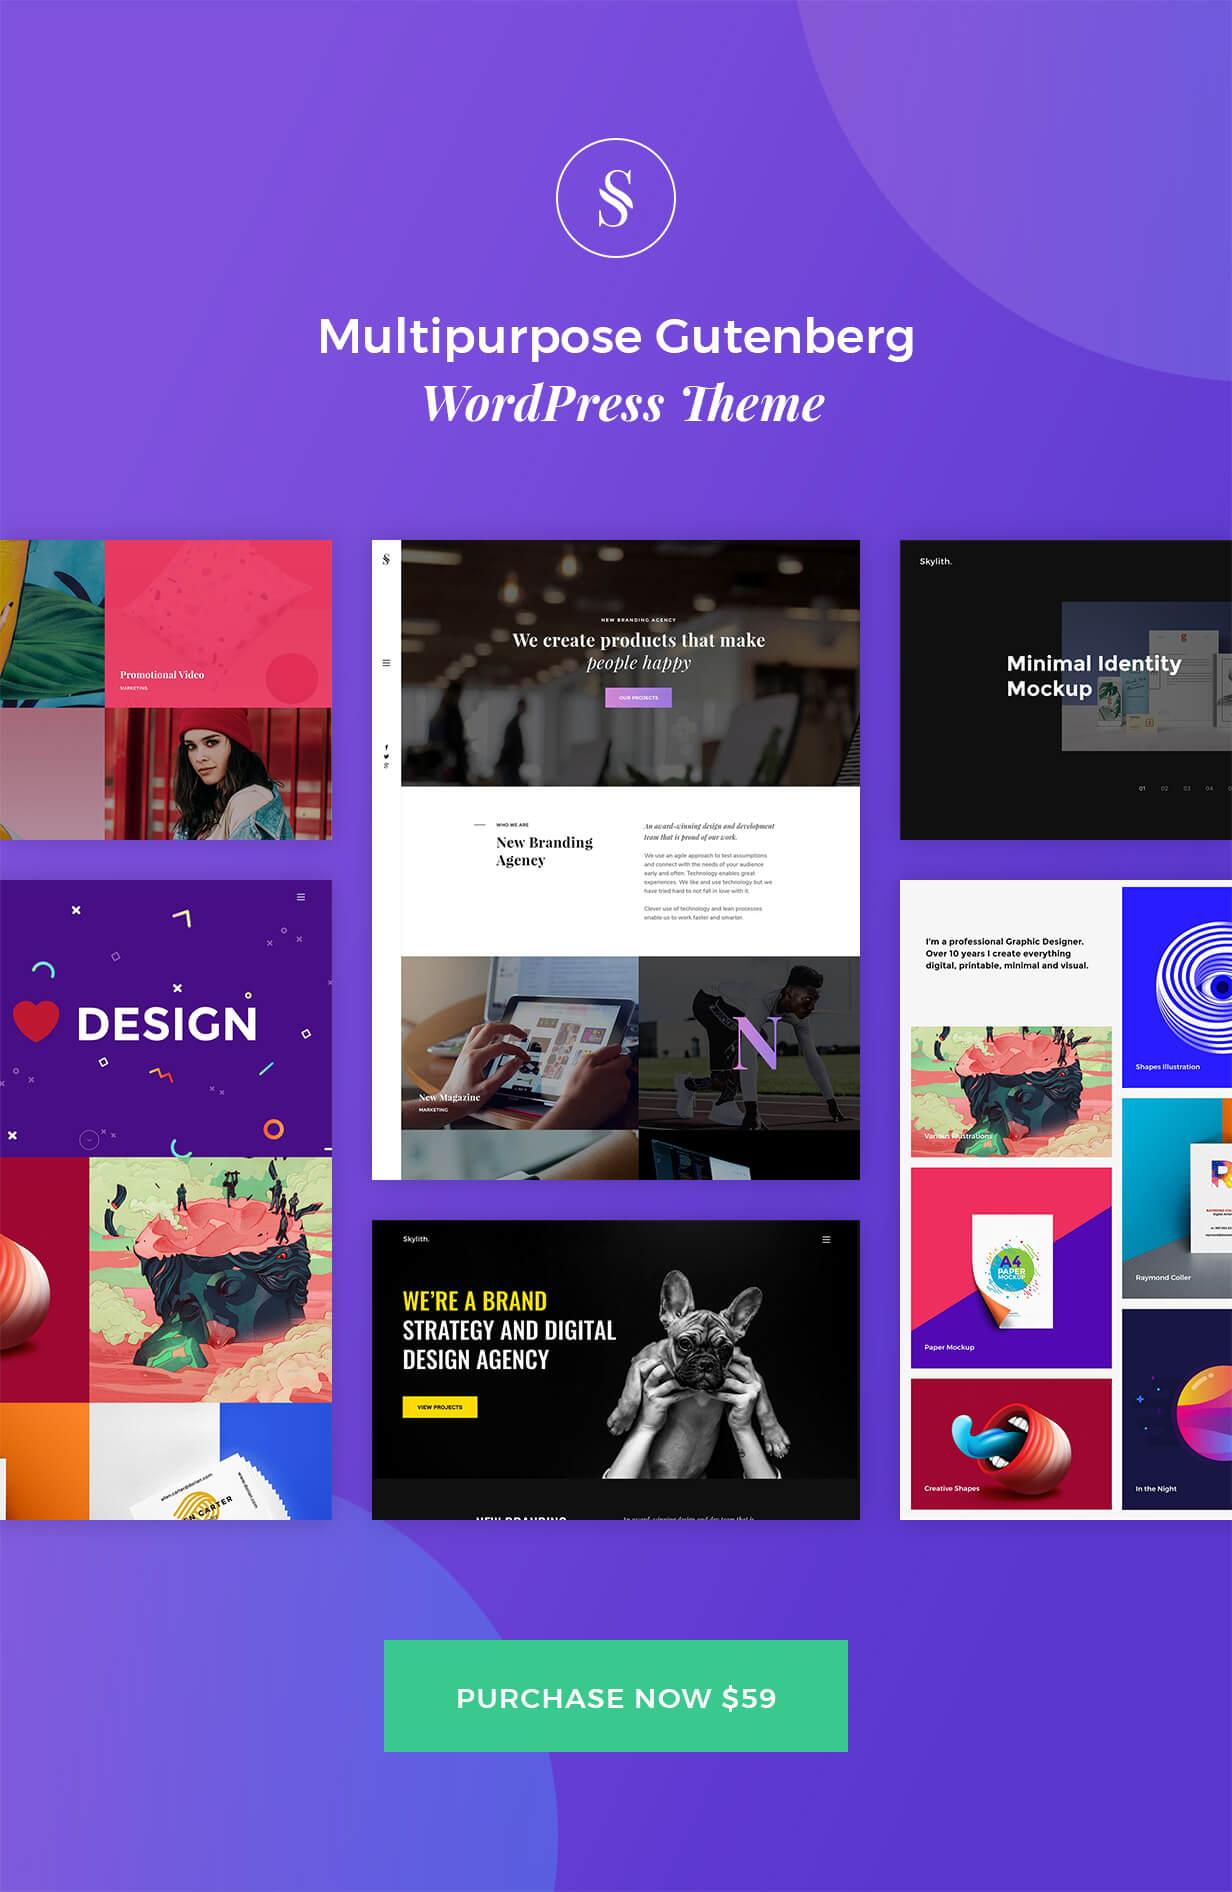 Mehrzweck-WordPress-Theme